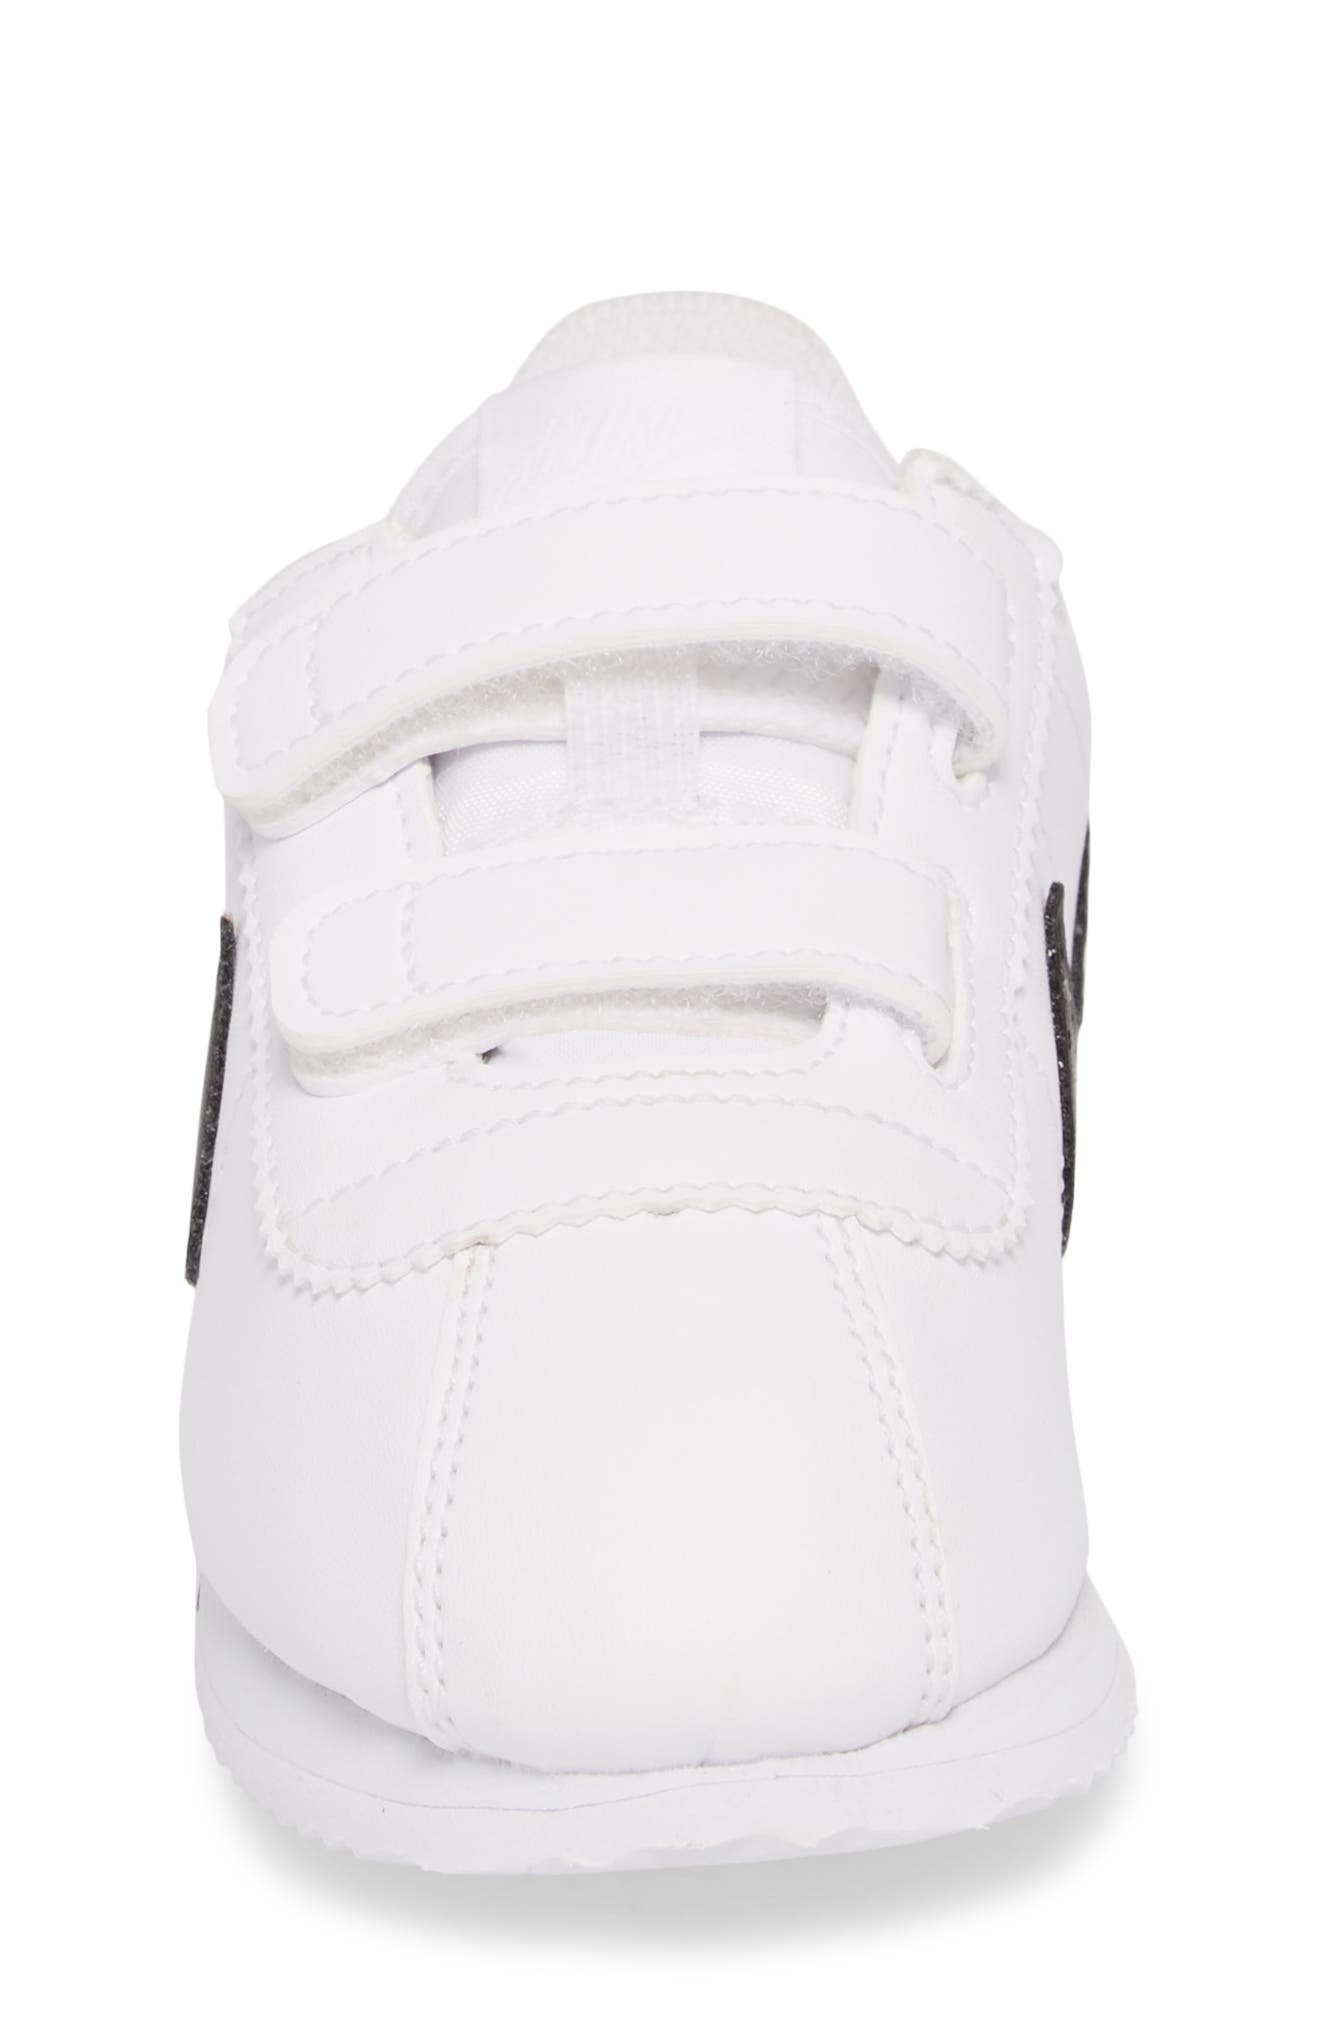 Cortez Basic SL Sneaker,                             Alternate thumbnail 4, color,                             White/ Black